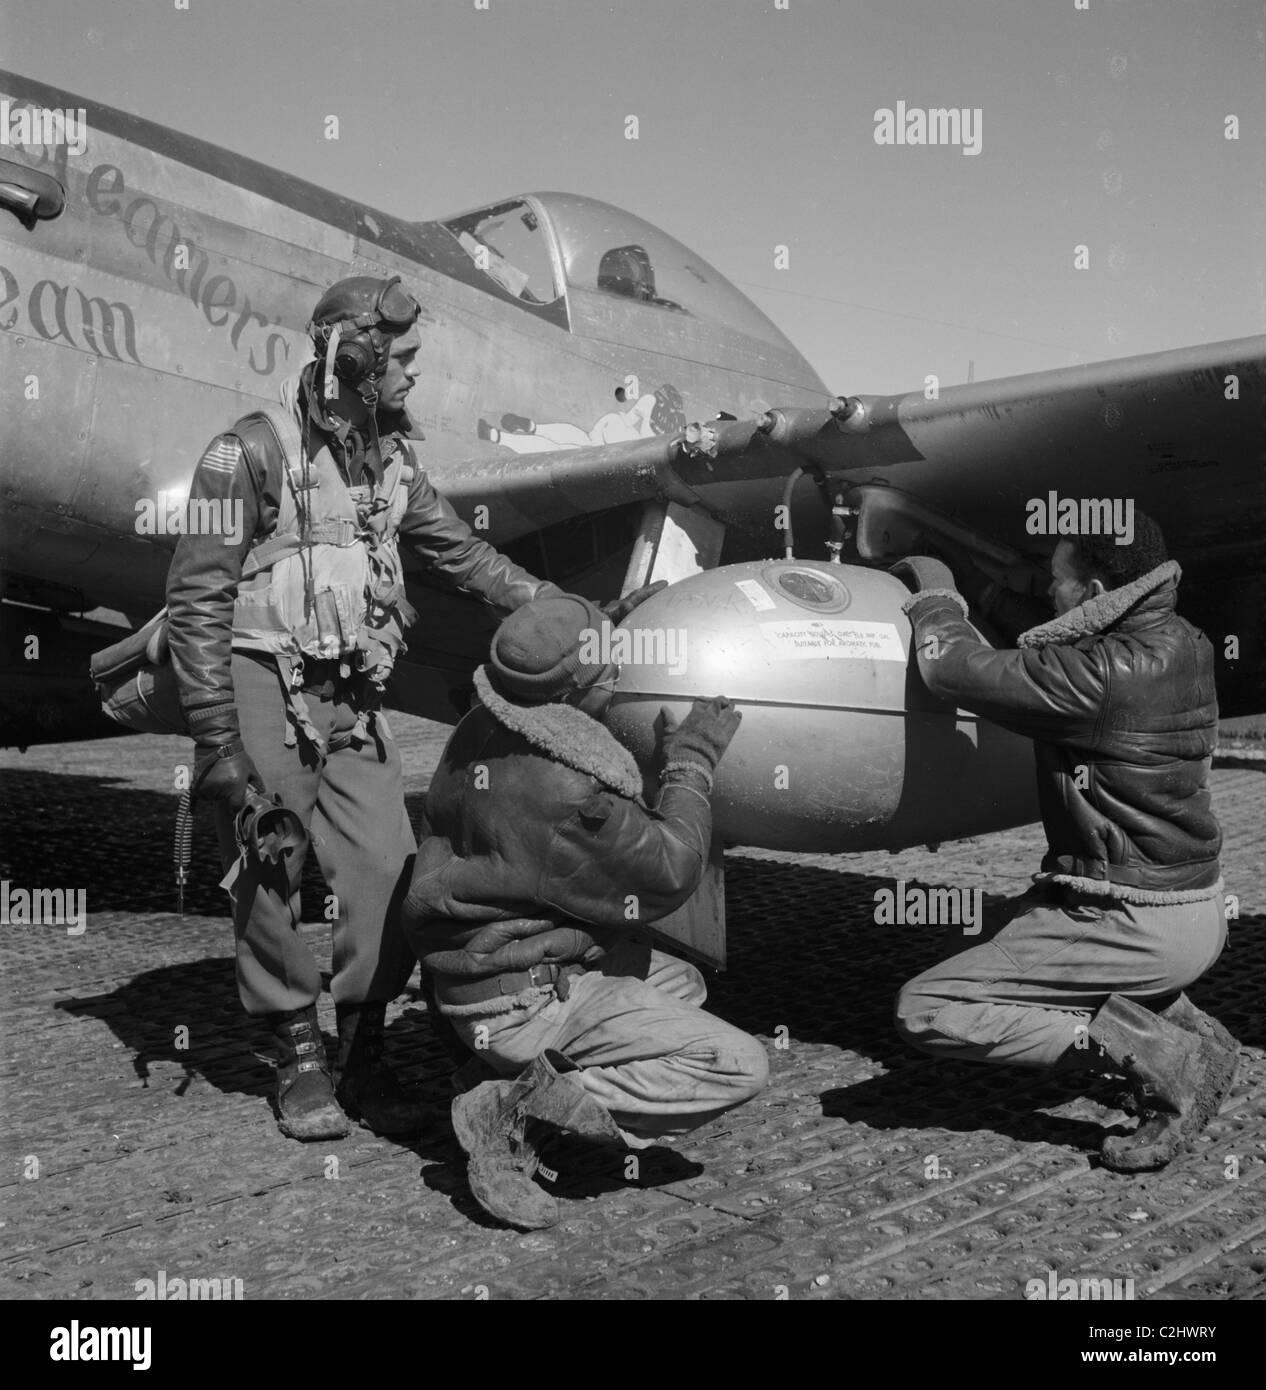 Edward C. Gleed et deux aviateurs, Ramitelli Tuskegee non identifiés, l'Italie, mars 1945] Photo Stock